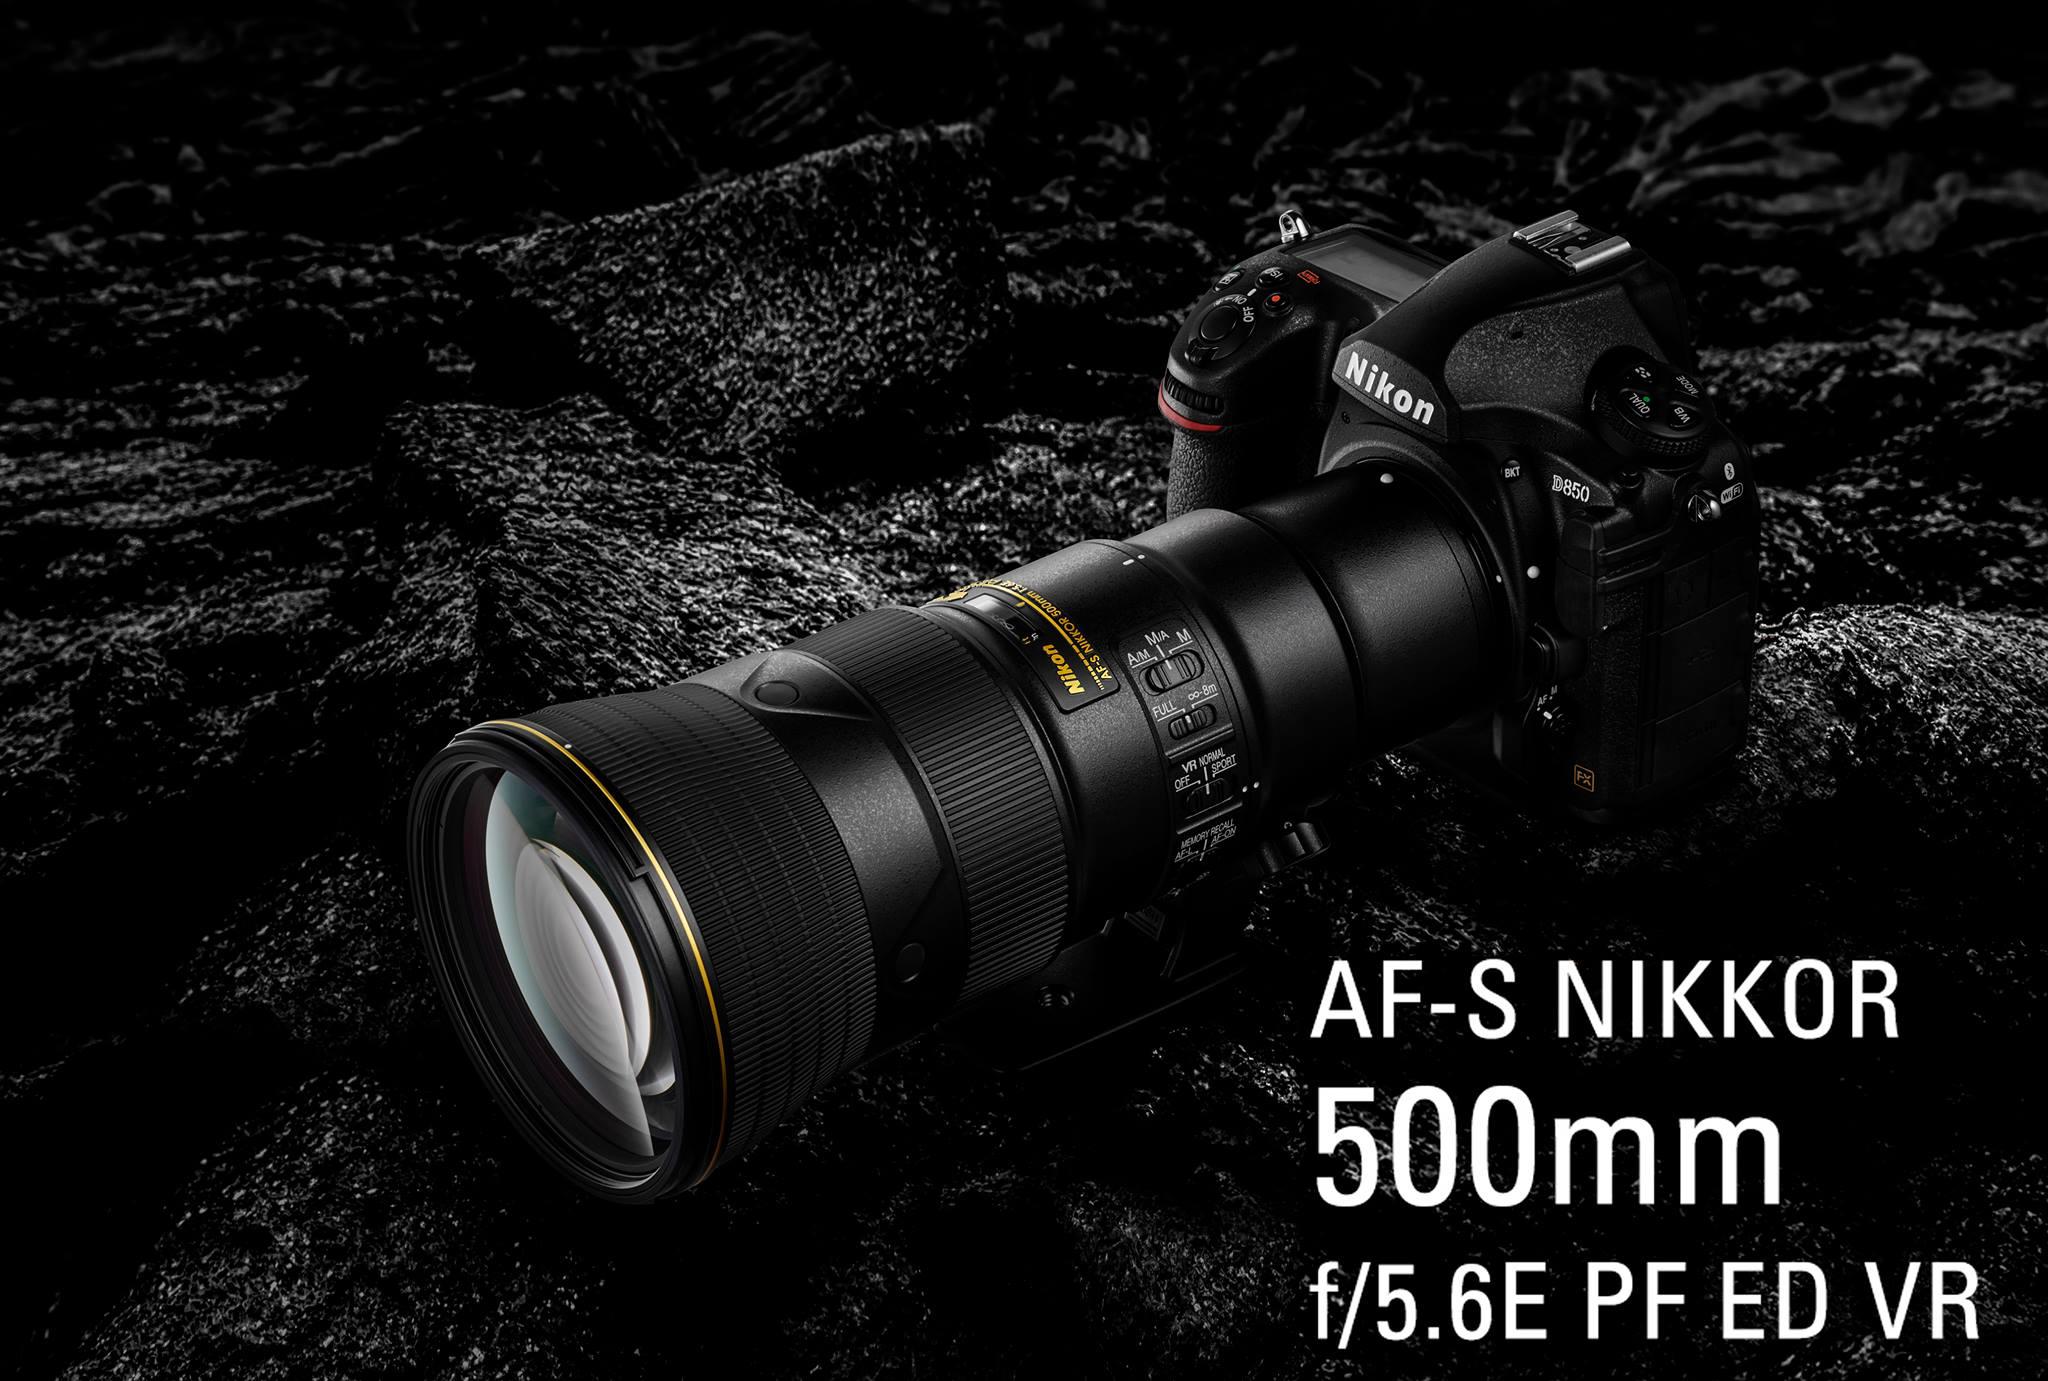 Ringfoto Baptist Zell Am See Nikon D5600 Kit Af P 18 55mm Vr Paket Neu Bei